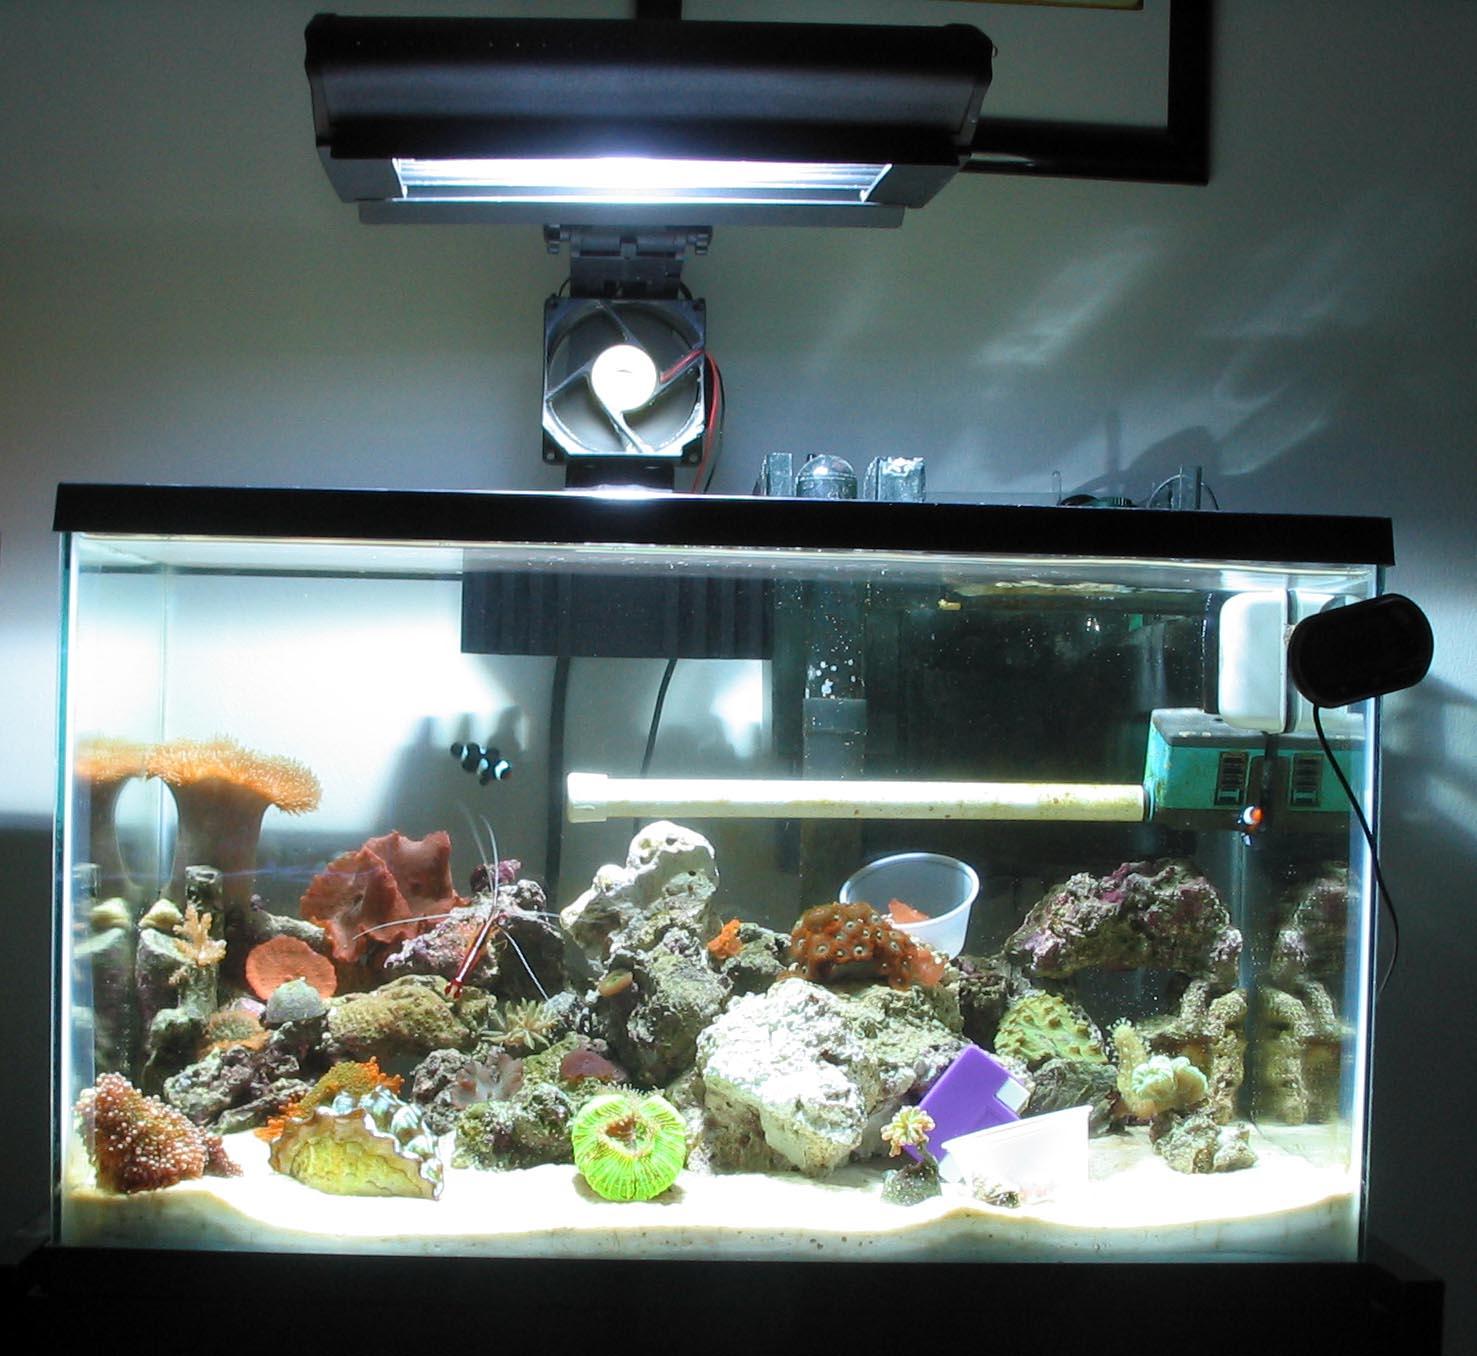 How do i start a 10 gallon salt water aquarium